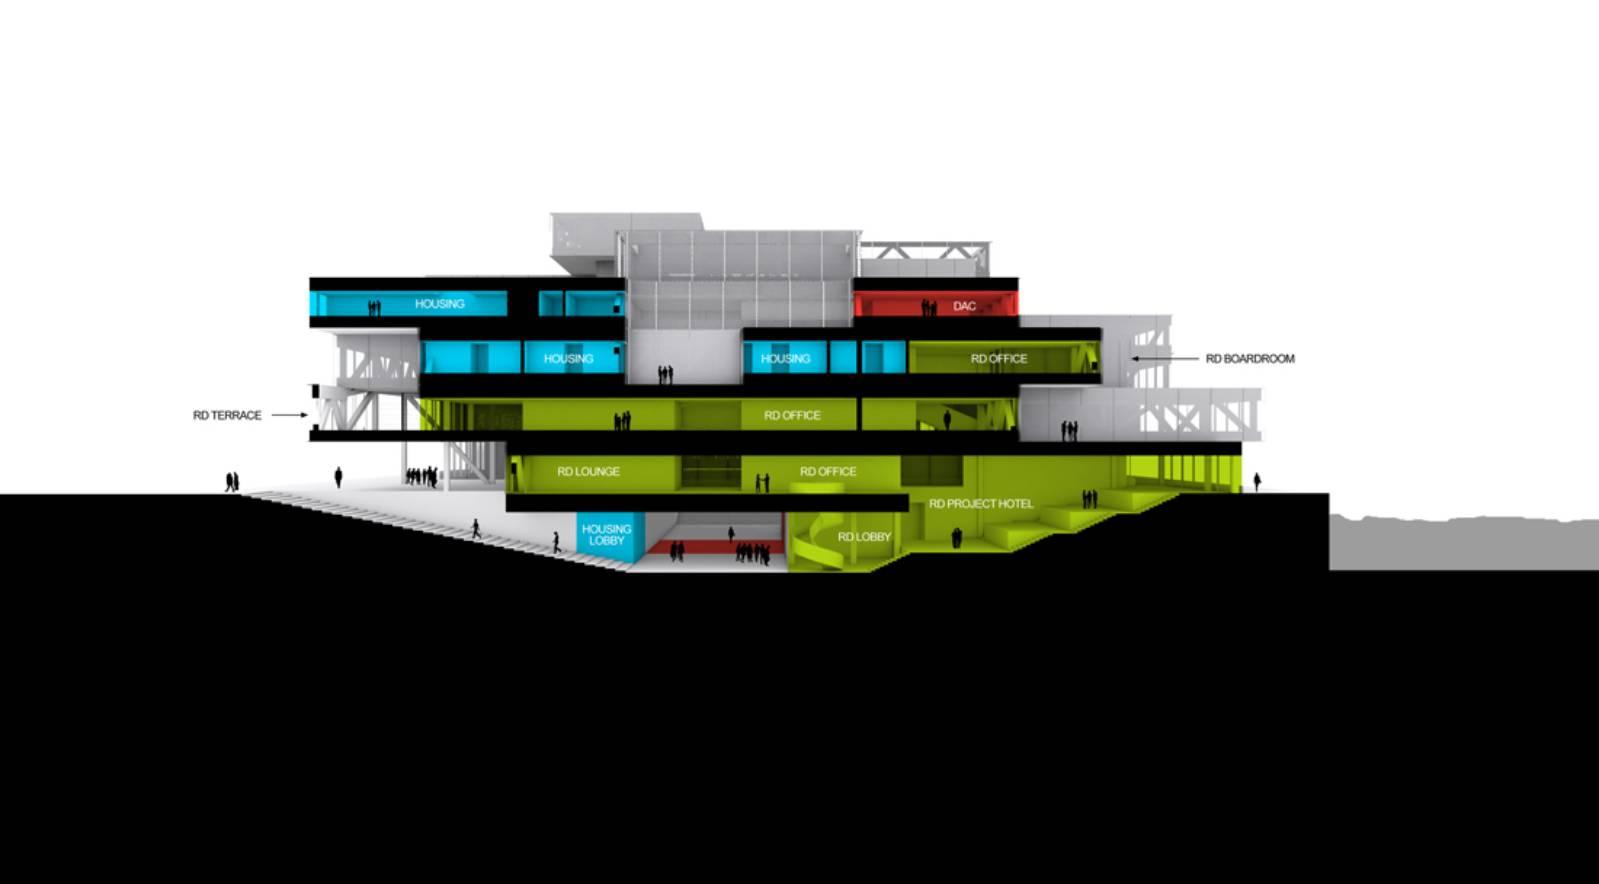 CONSTRUCTION BEGINS OF BRYGHUSPROJEKTET BY OMA | A As